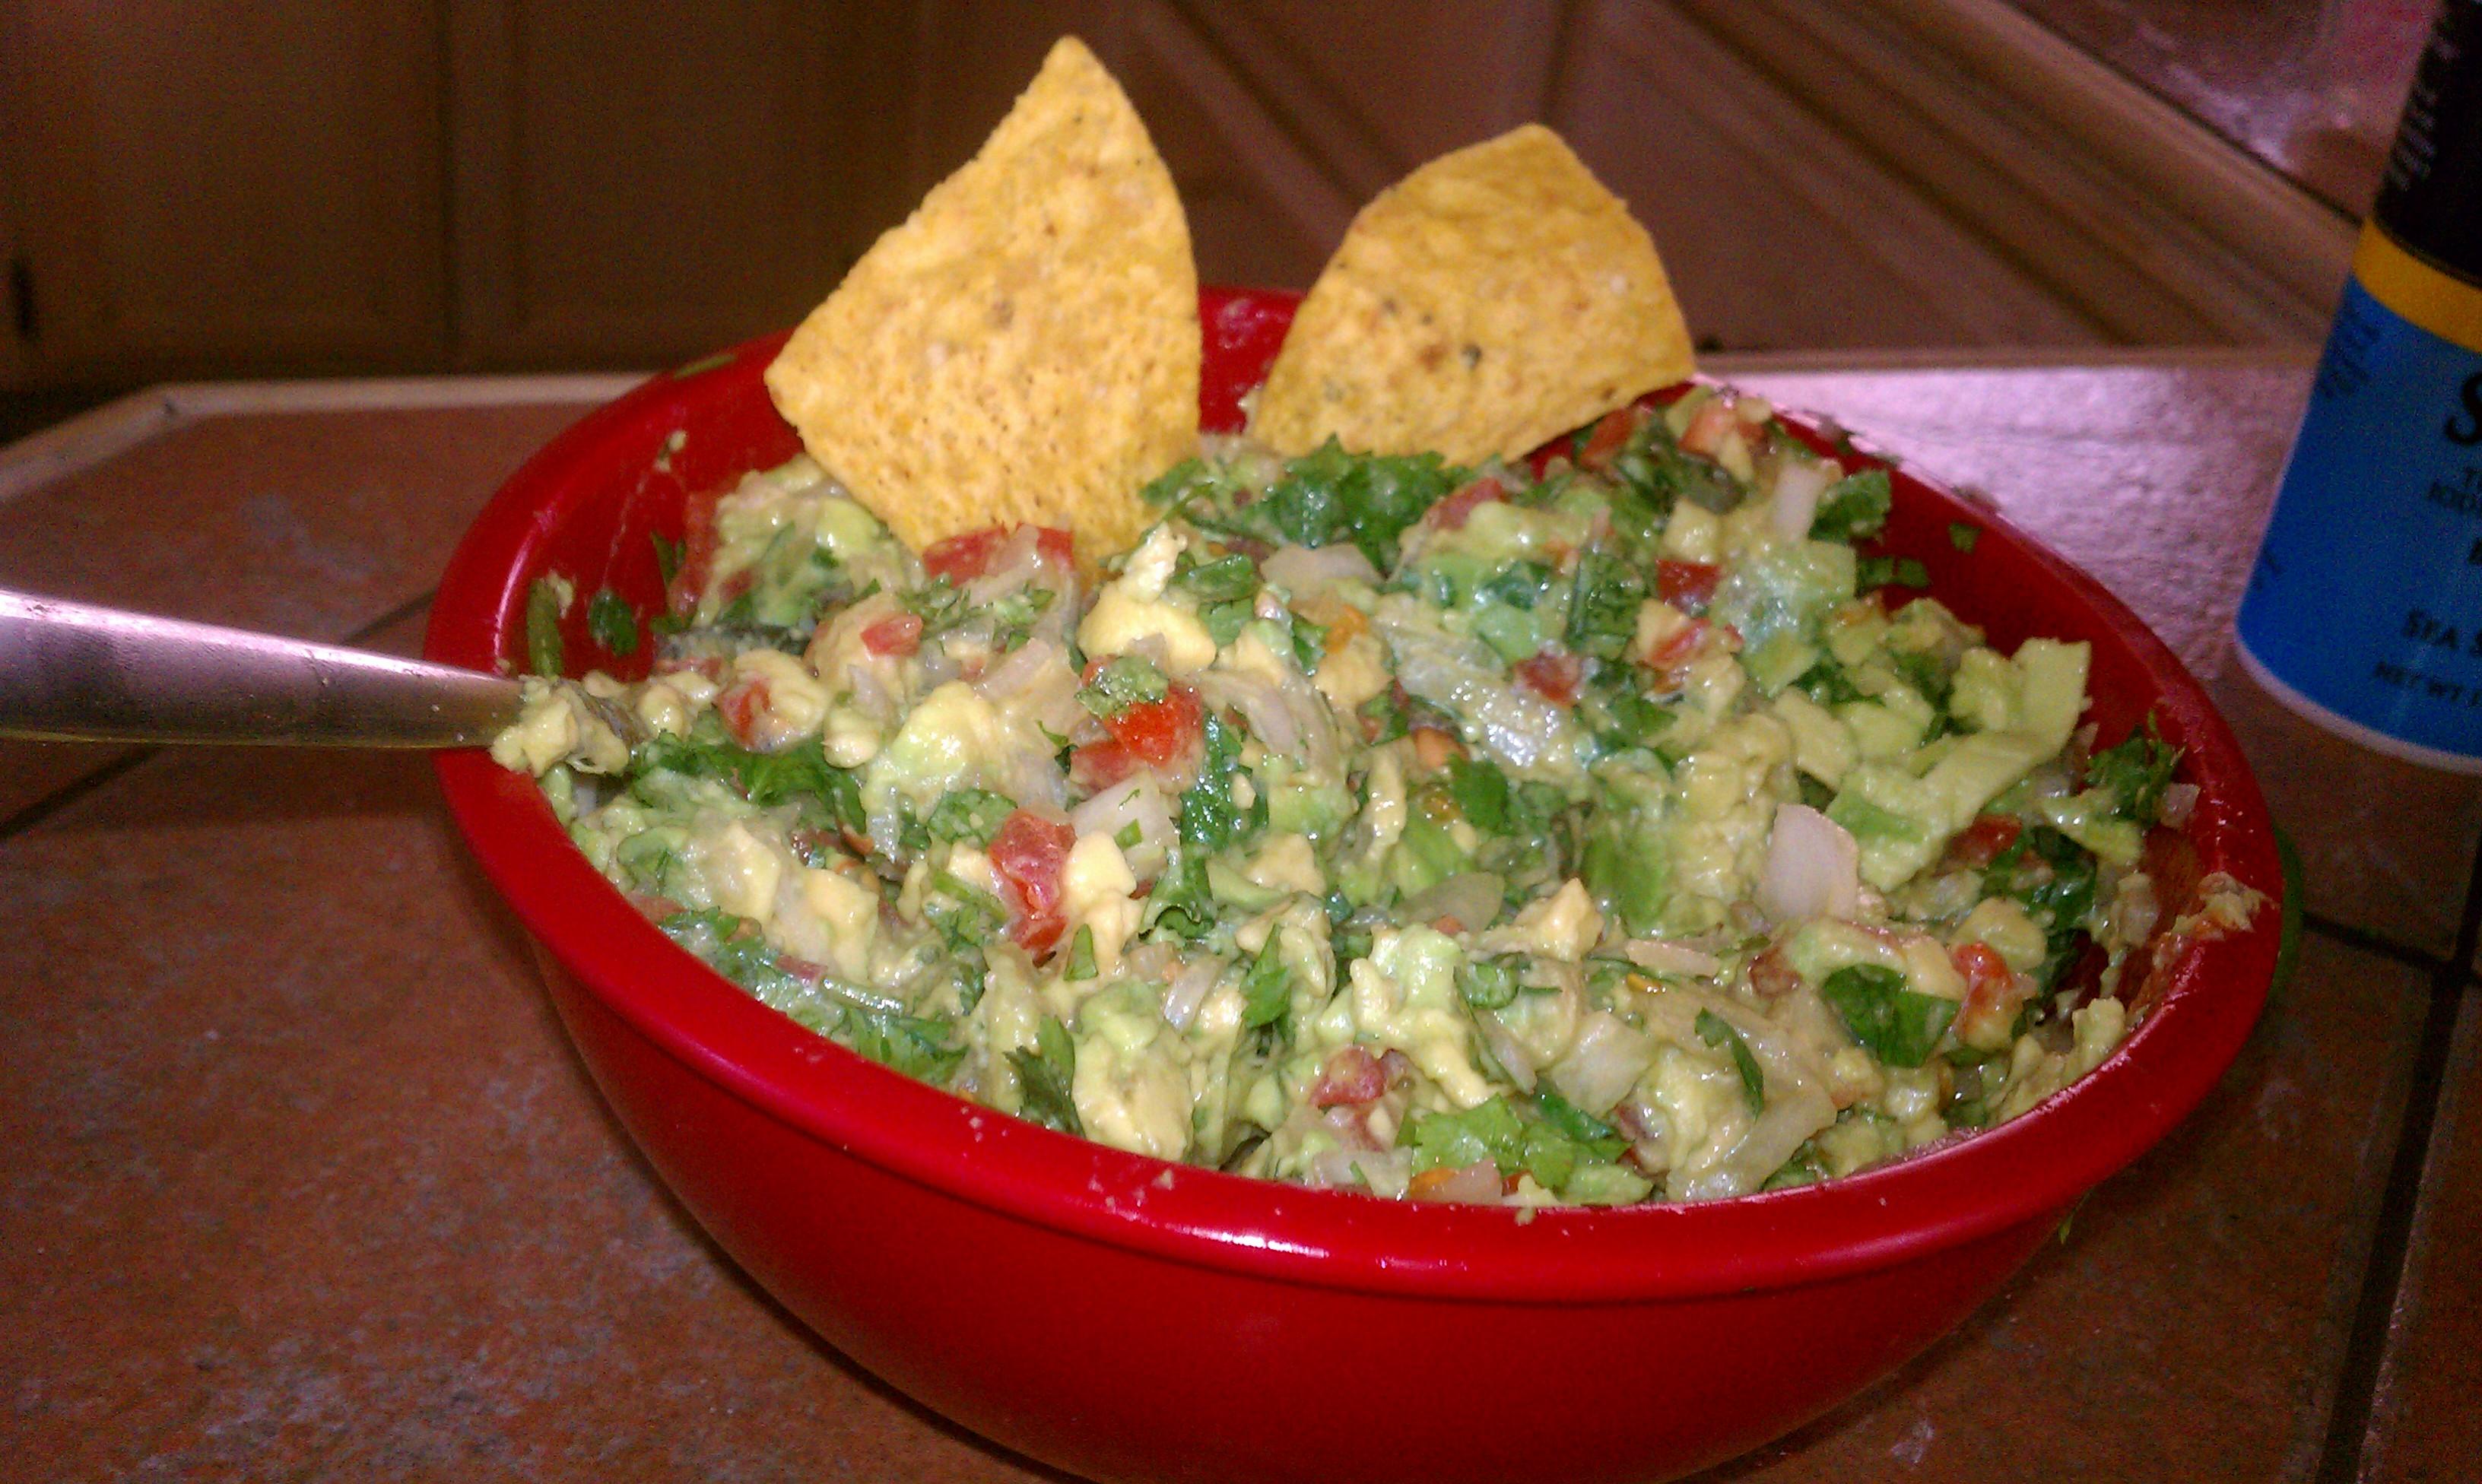 La Joya TX. :: Avocado salad it was amazing!